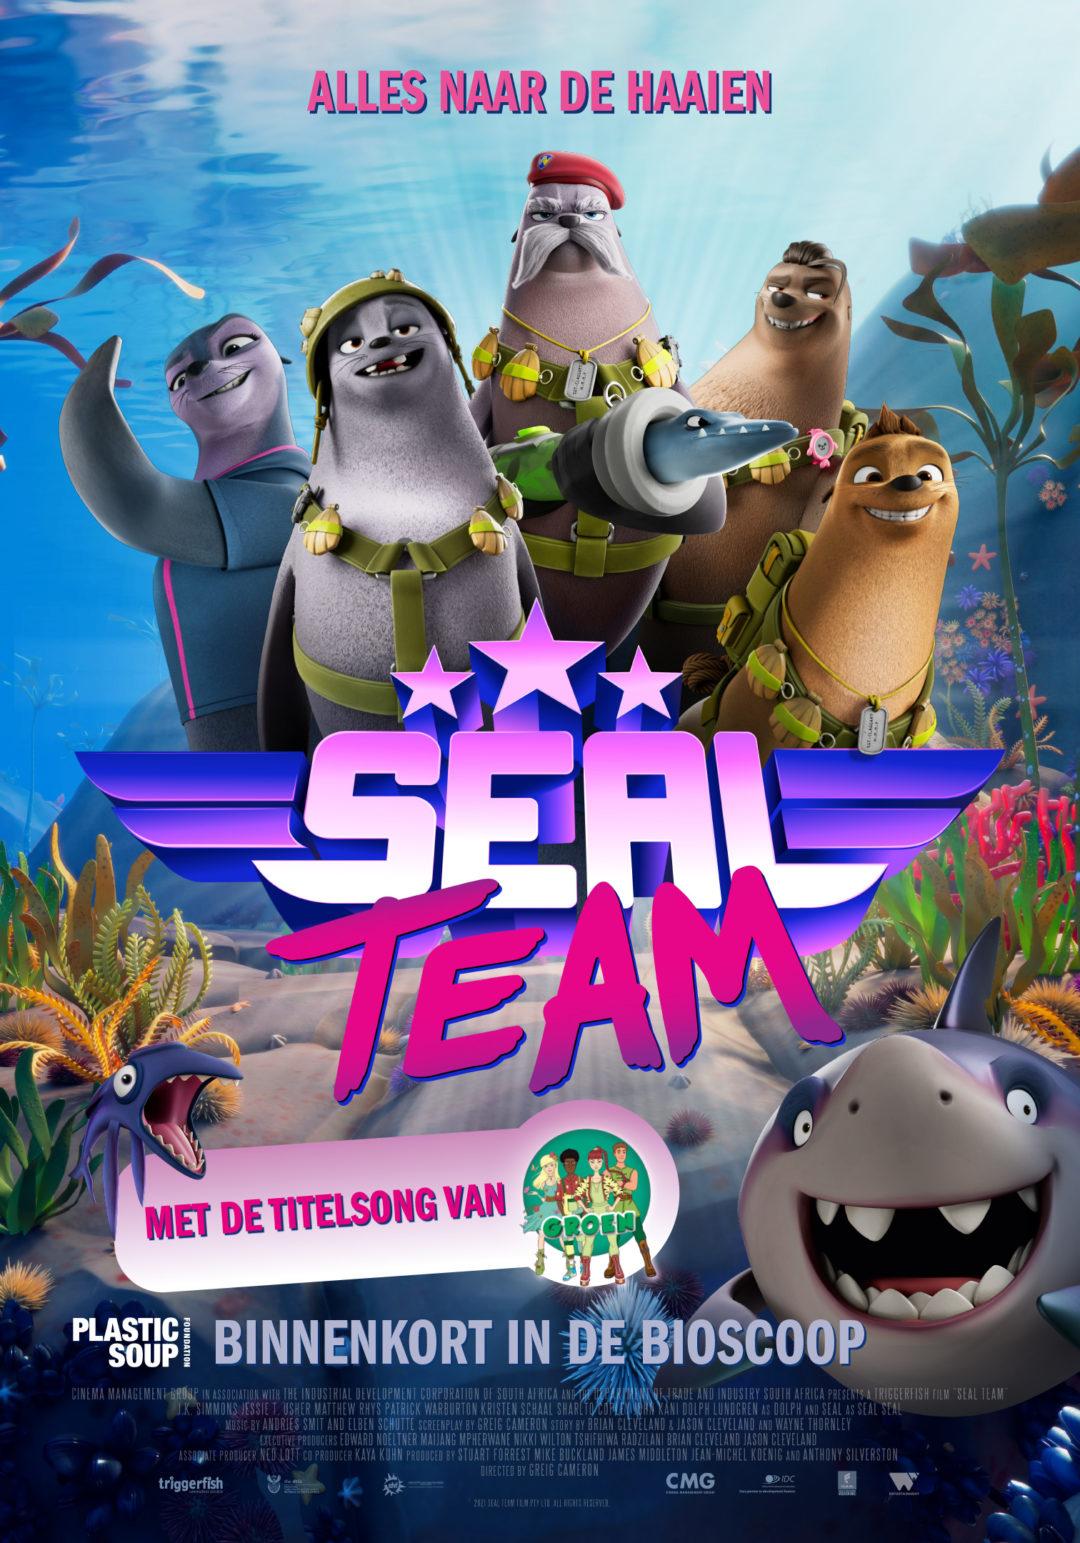 Seal-Team_ps_1_jpg_sd-high_Copyright-2021-WW-Entertainment.jpg